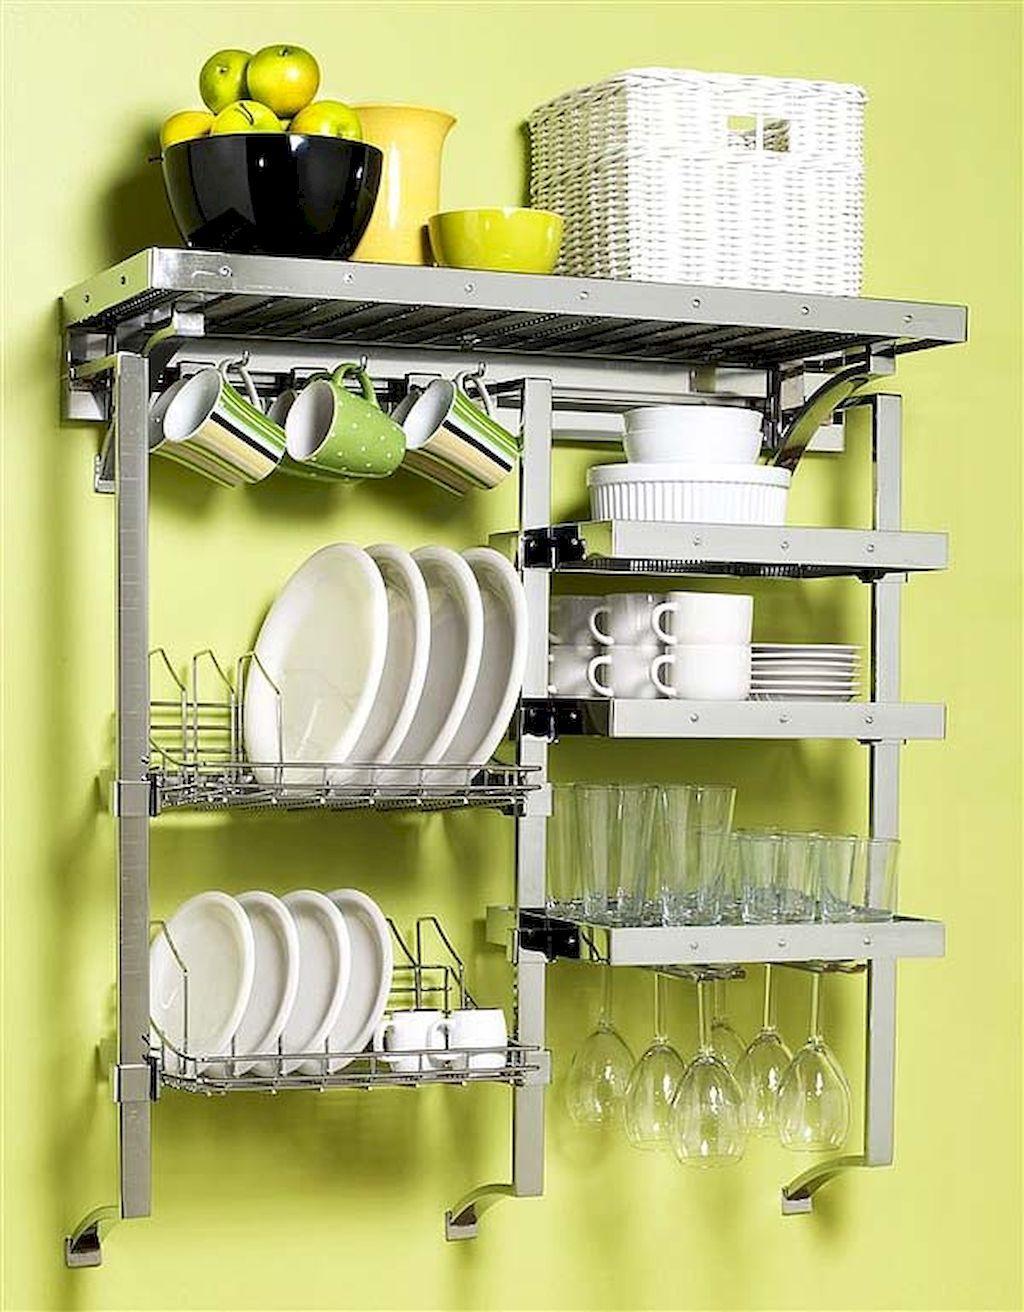 55 Smart DIY Apartment Storage Ideas on A Budget | Storage ideas ...